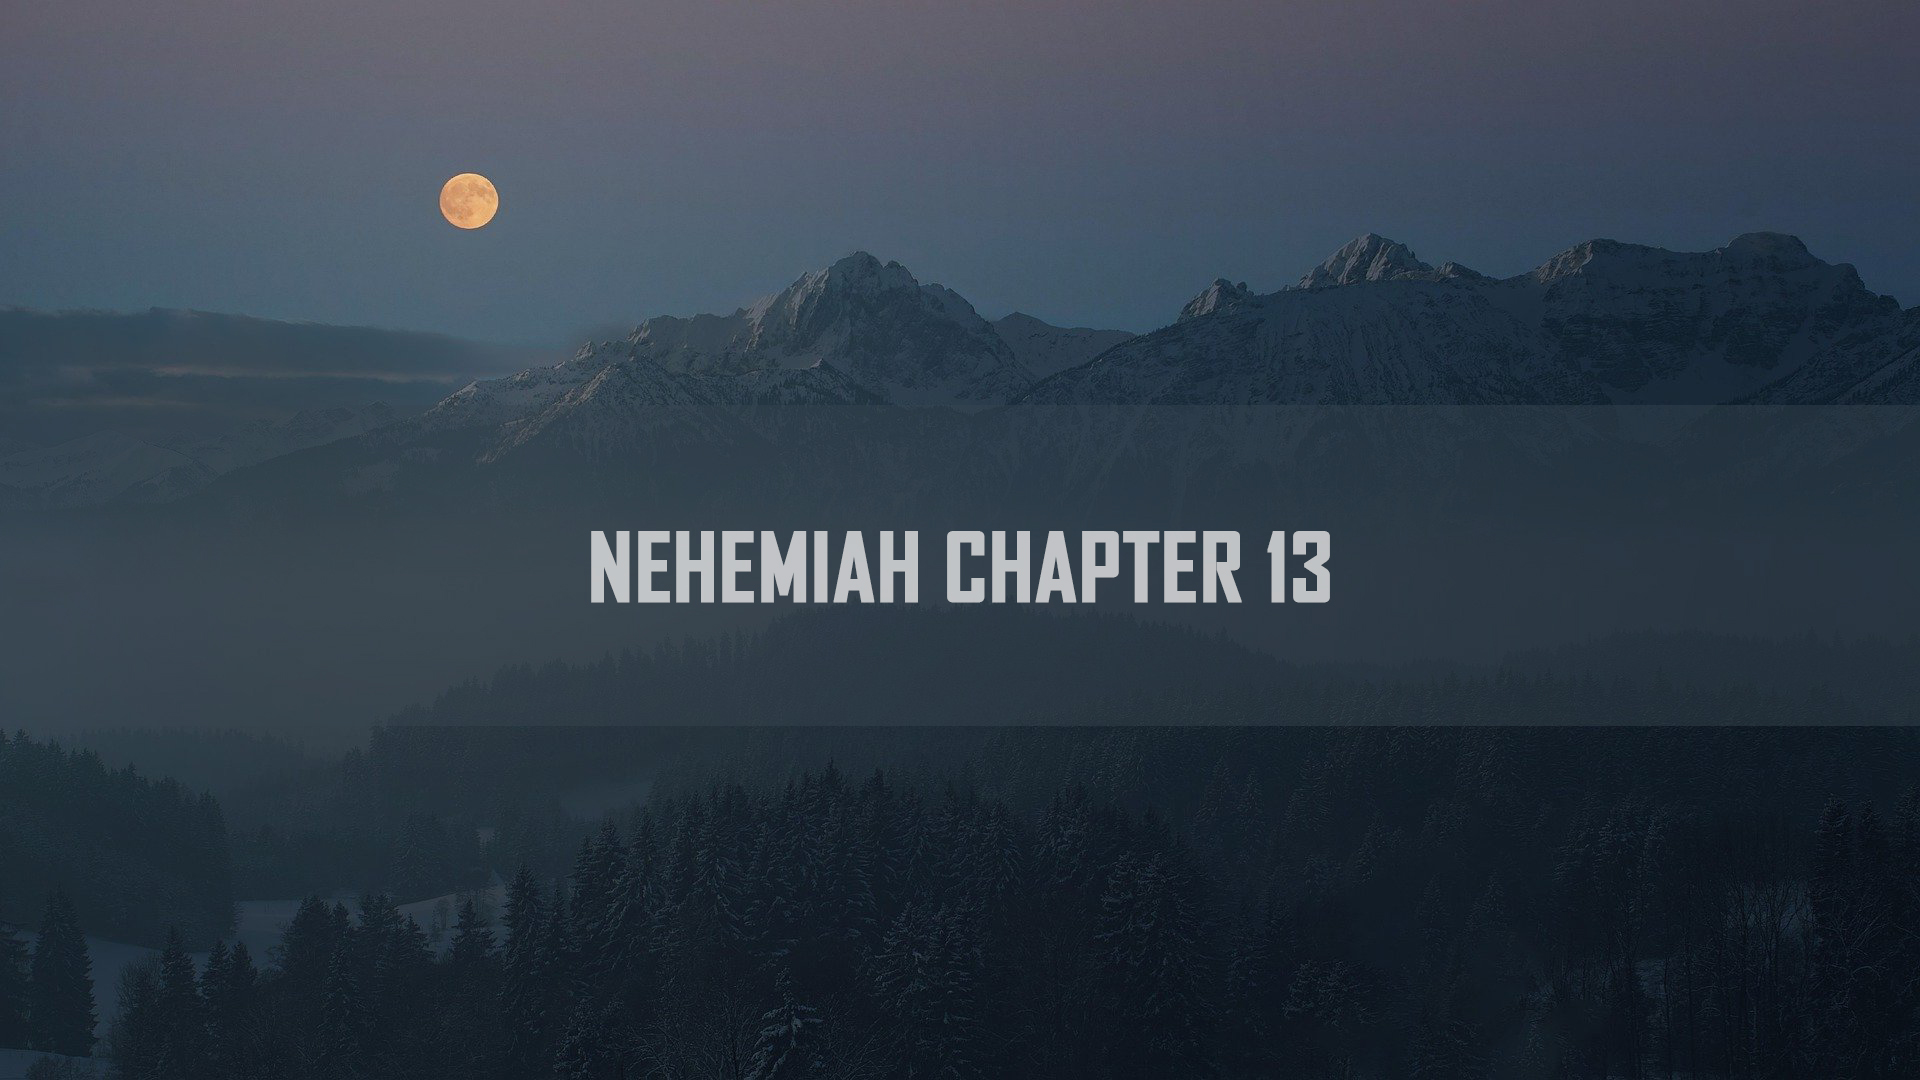 Nehemiah Chapter <br/> Sujith M John